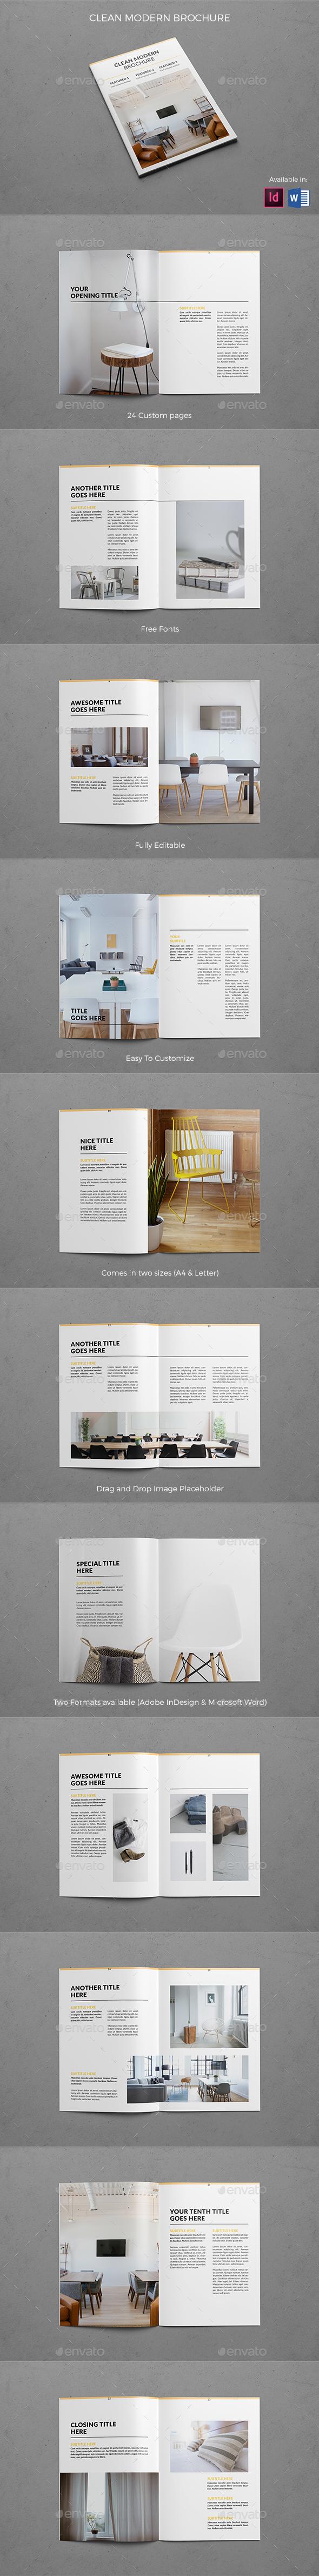 Clean Modern Brochure - Brochures Print Templates